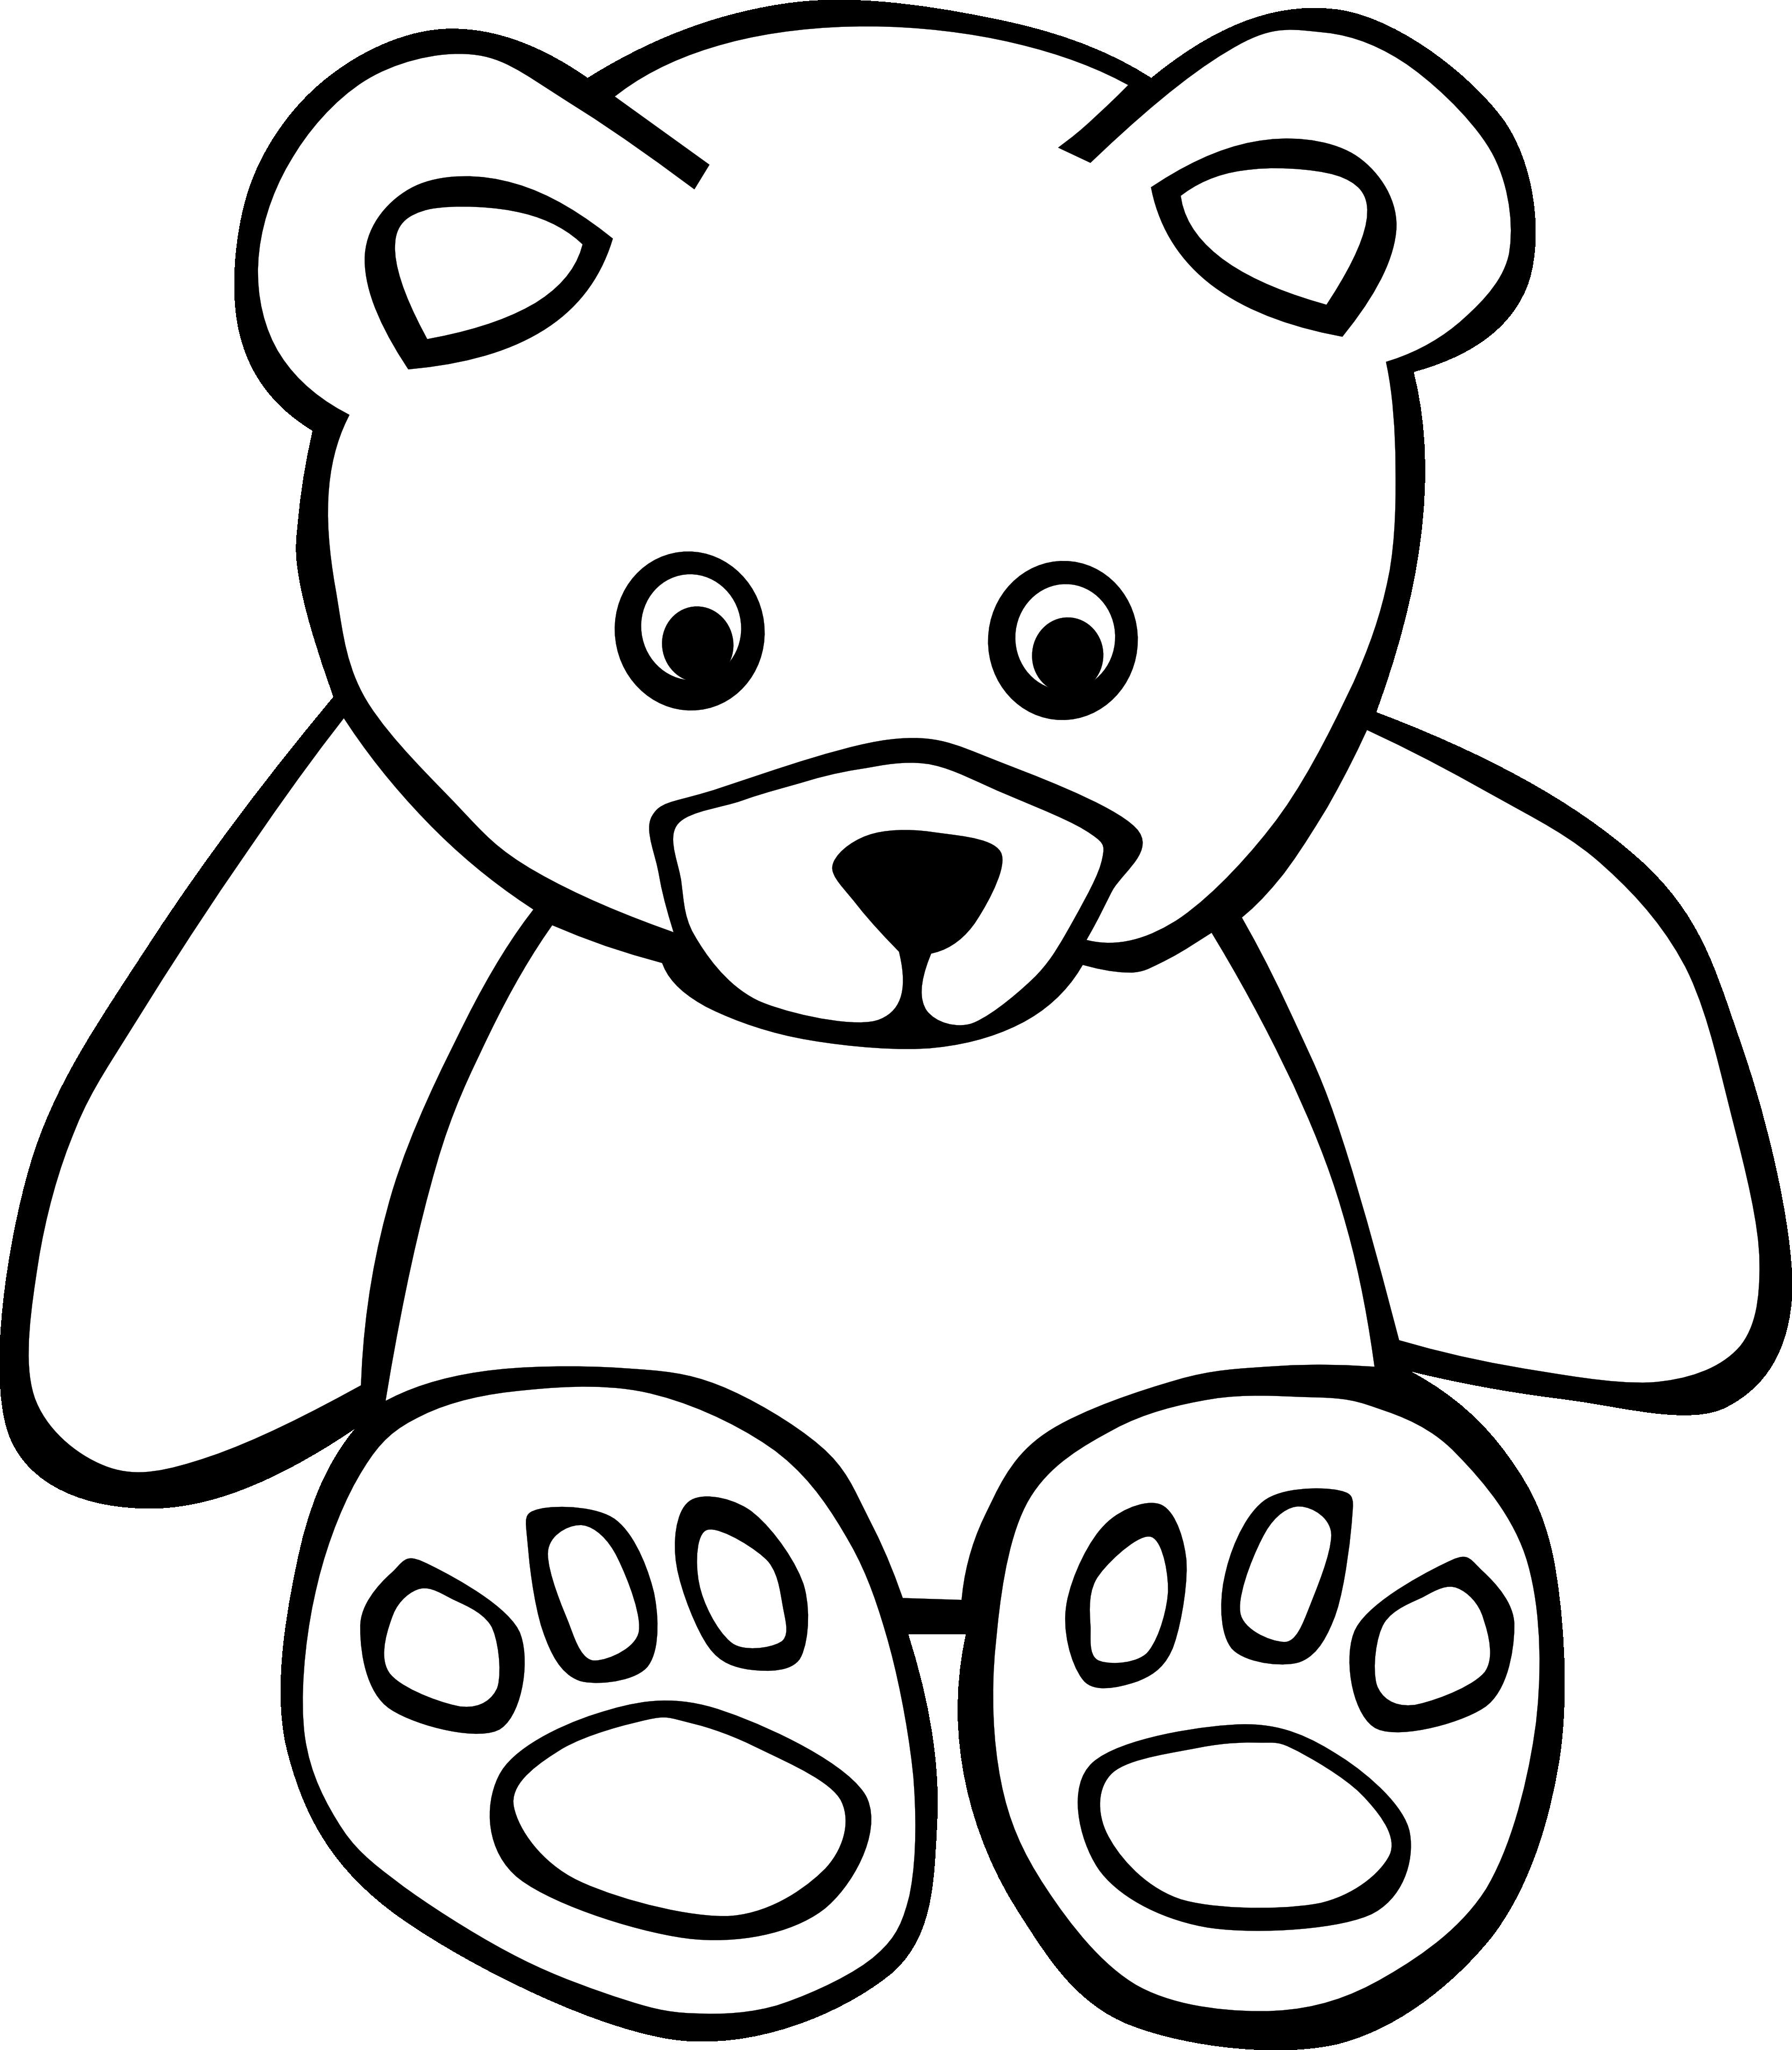 Black Bear Clipart u0026middot; Black Clip Art u0026middot; Teddy Bear Clip Art